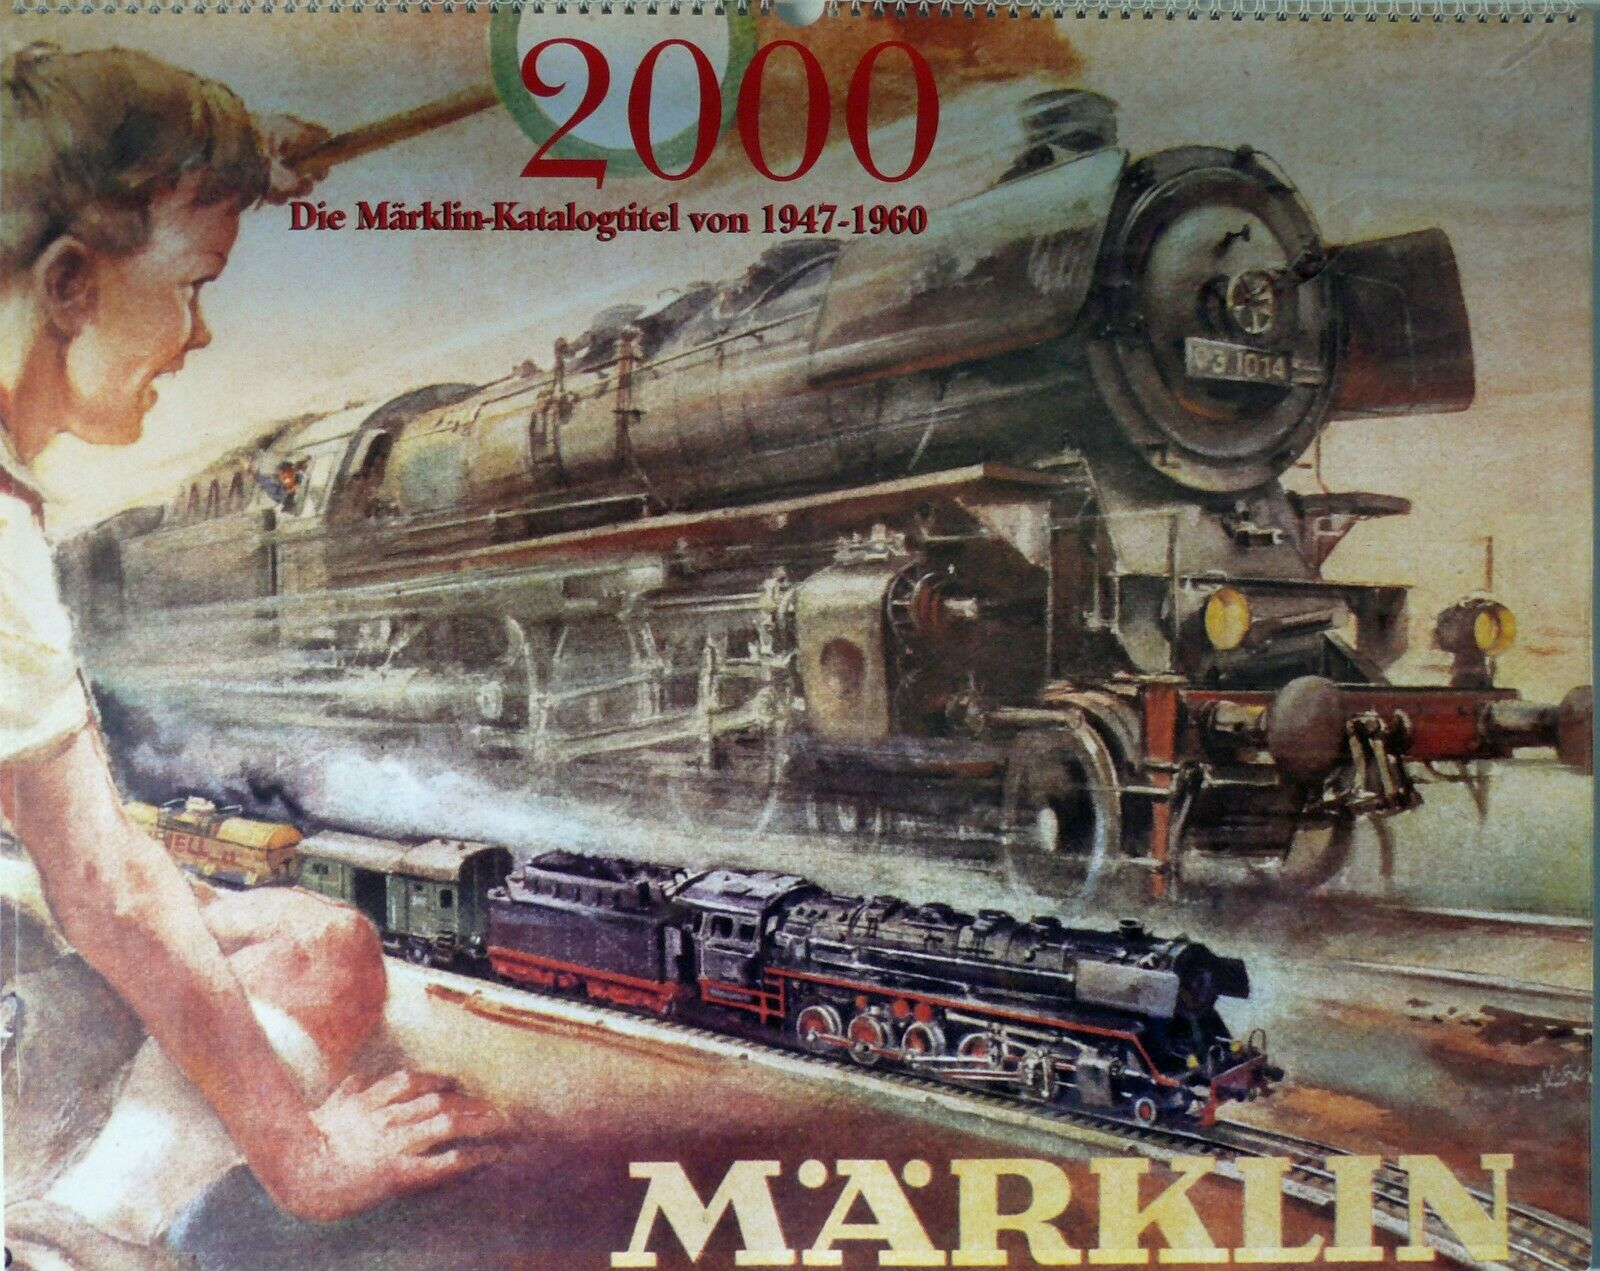 Marklin Millennium 2000 Dealers Calendar in original perfect condition